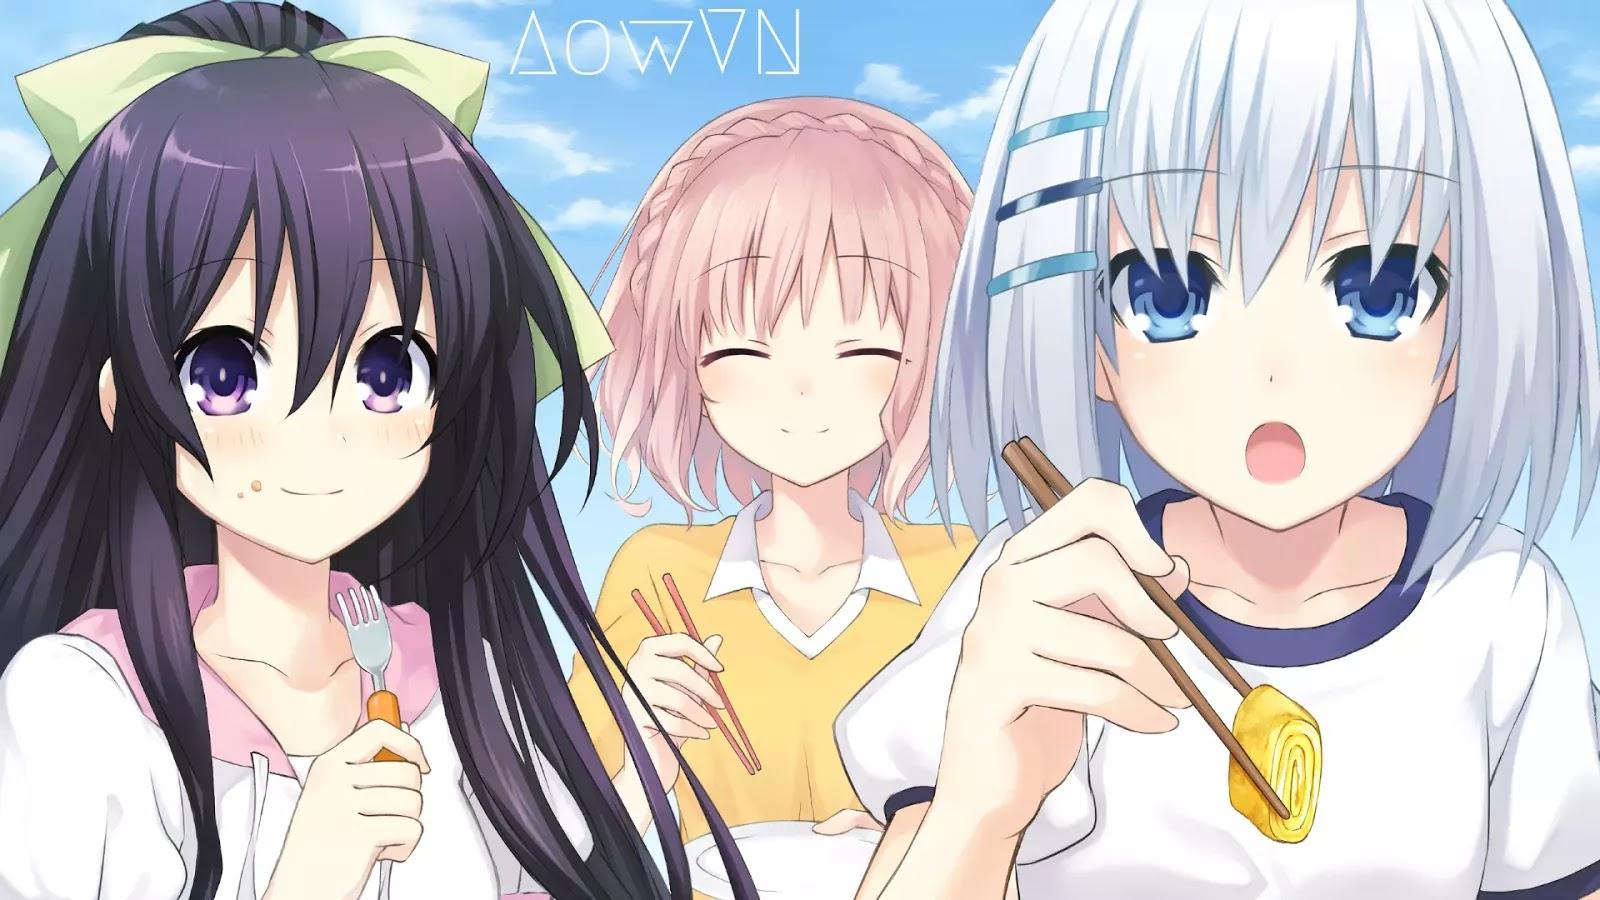 AowVN.org min%2B%25284%2529 - [ Anime 3gp Mp4 ] Date a live SS1 + SS2 + OVA + Movie | Vietsub - Harem Hay